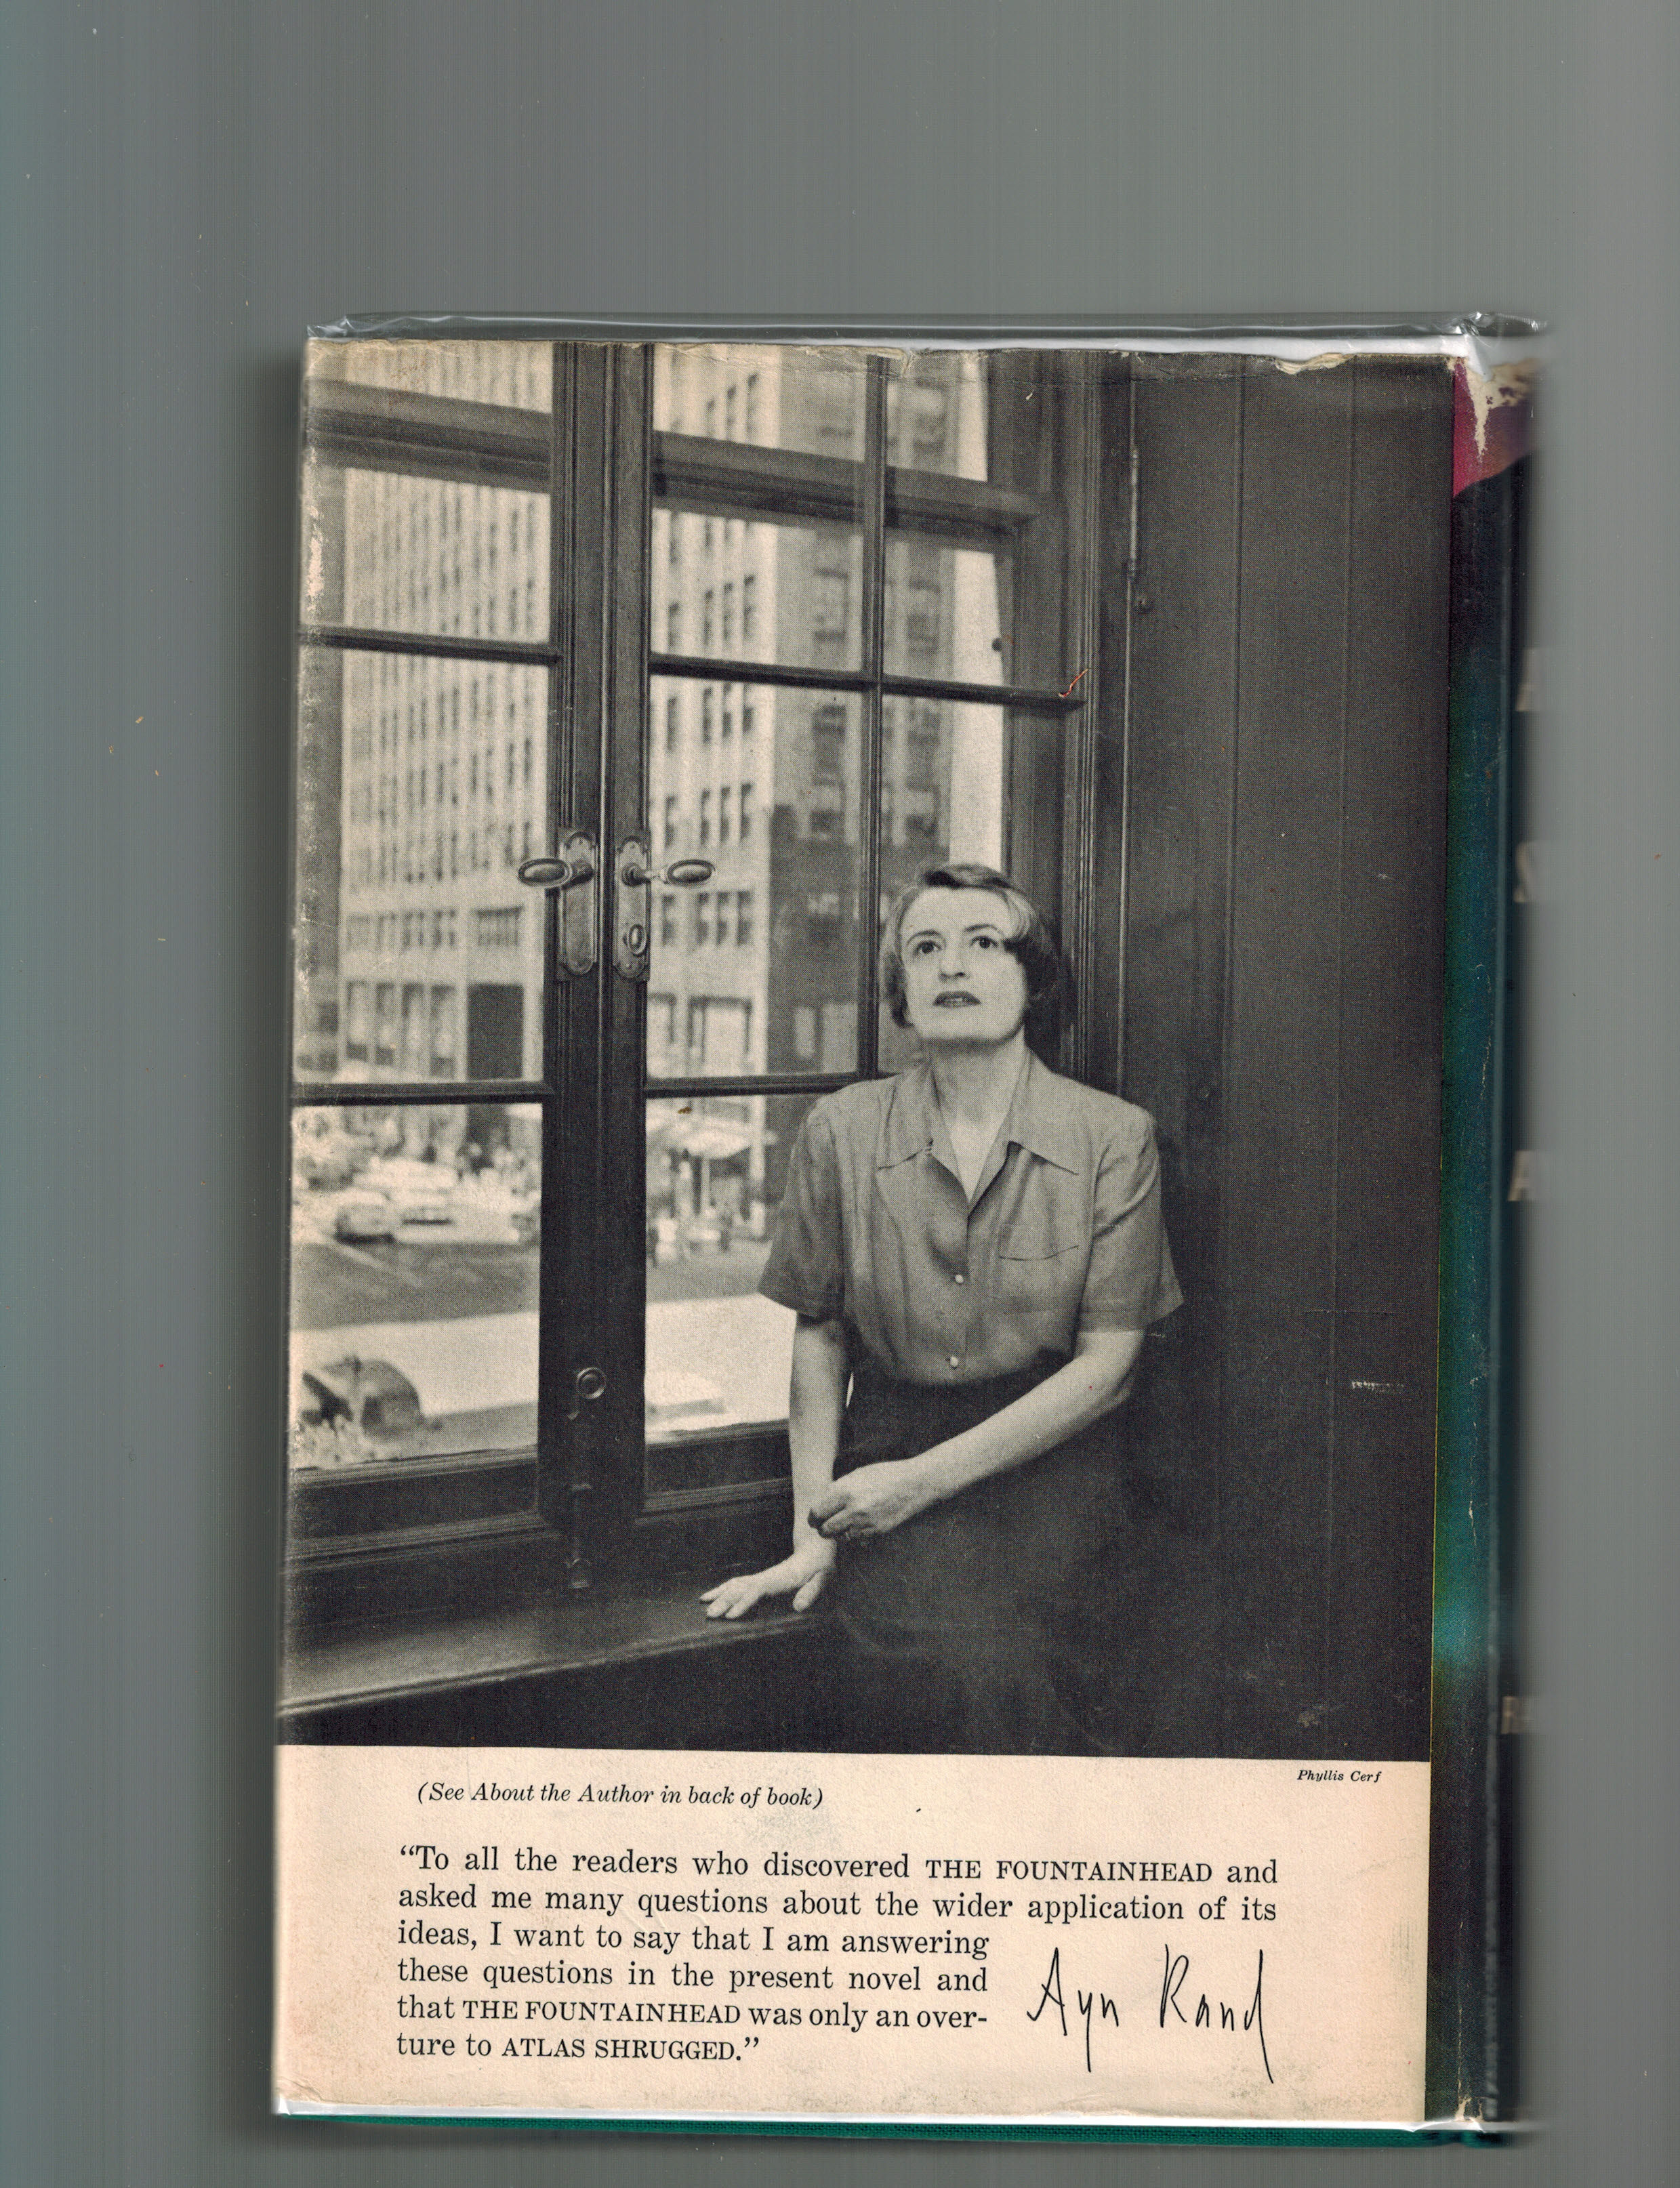 Atlas Shrugged: A Novel by Ayn Rand - Hardcover - 1957